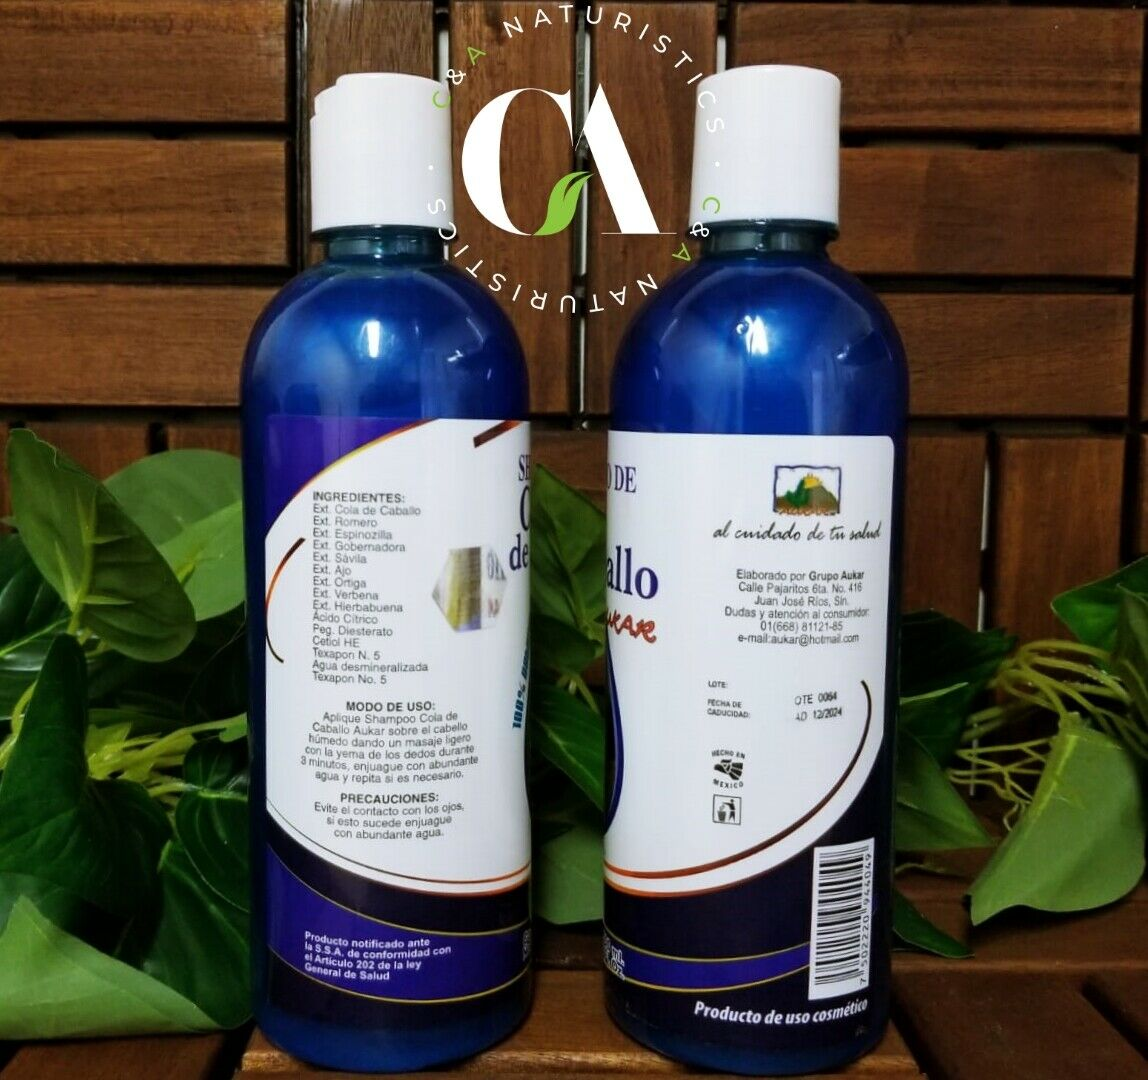 Shampoo de Cola de Caballo100% Natural 500ml. Marca Aukar (2Pack) Para Crecimien 1